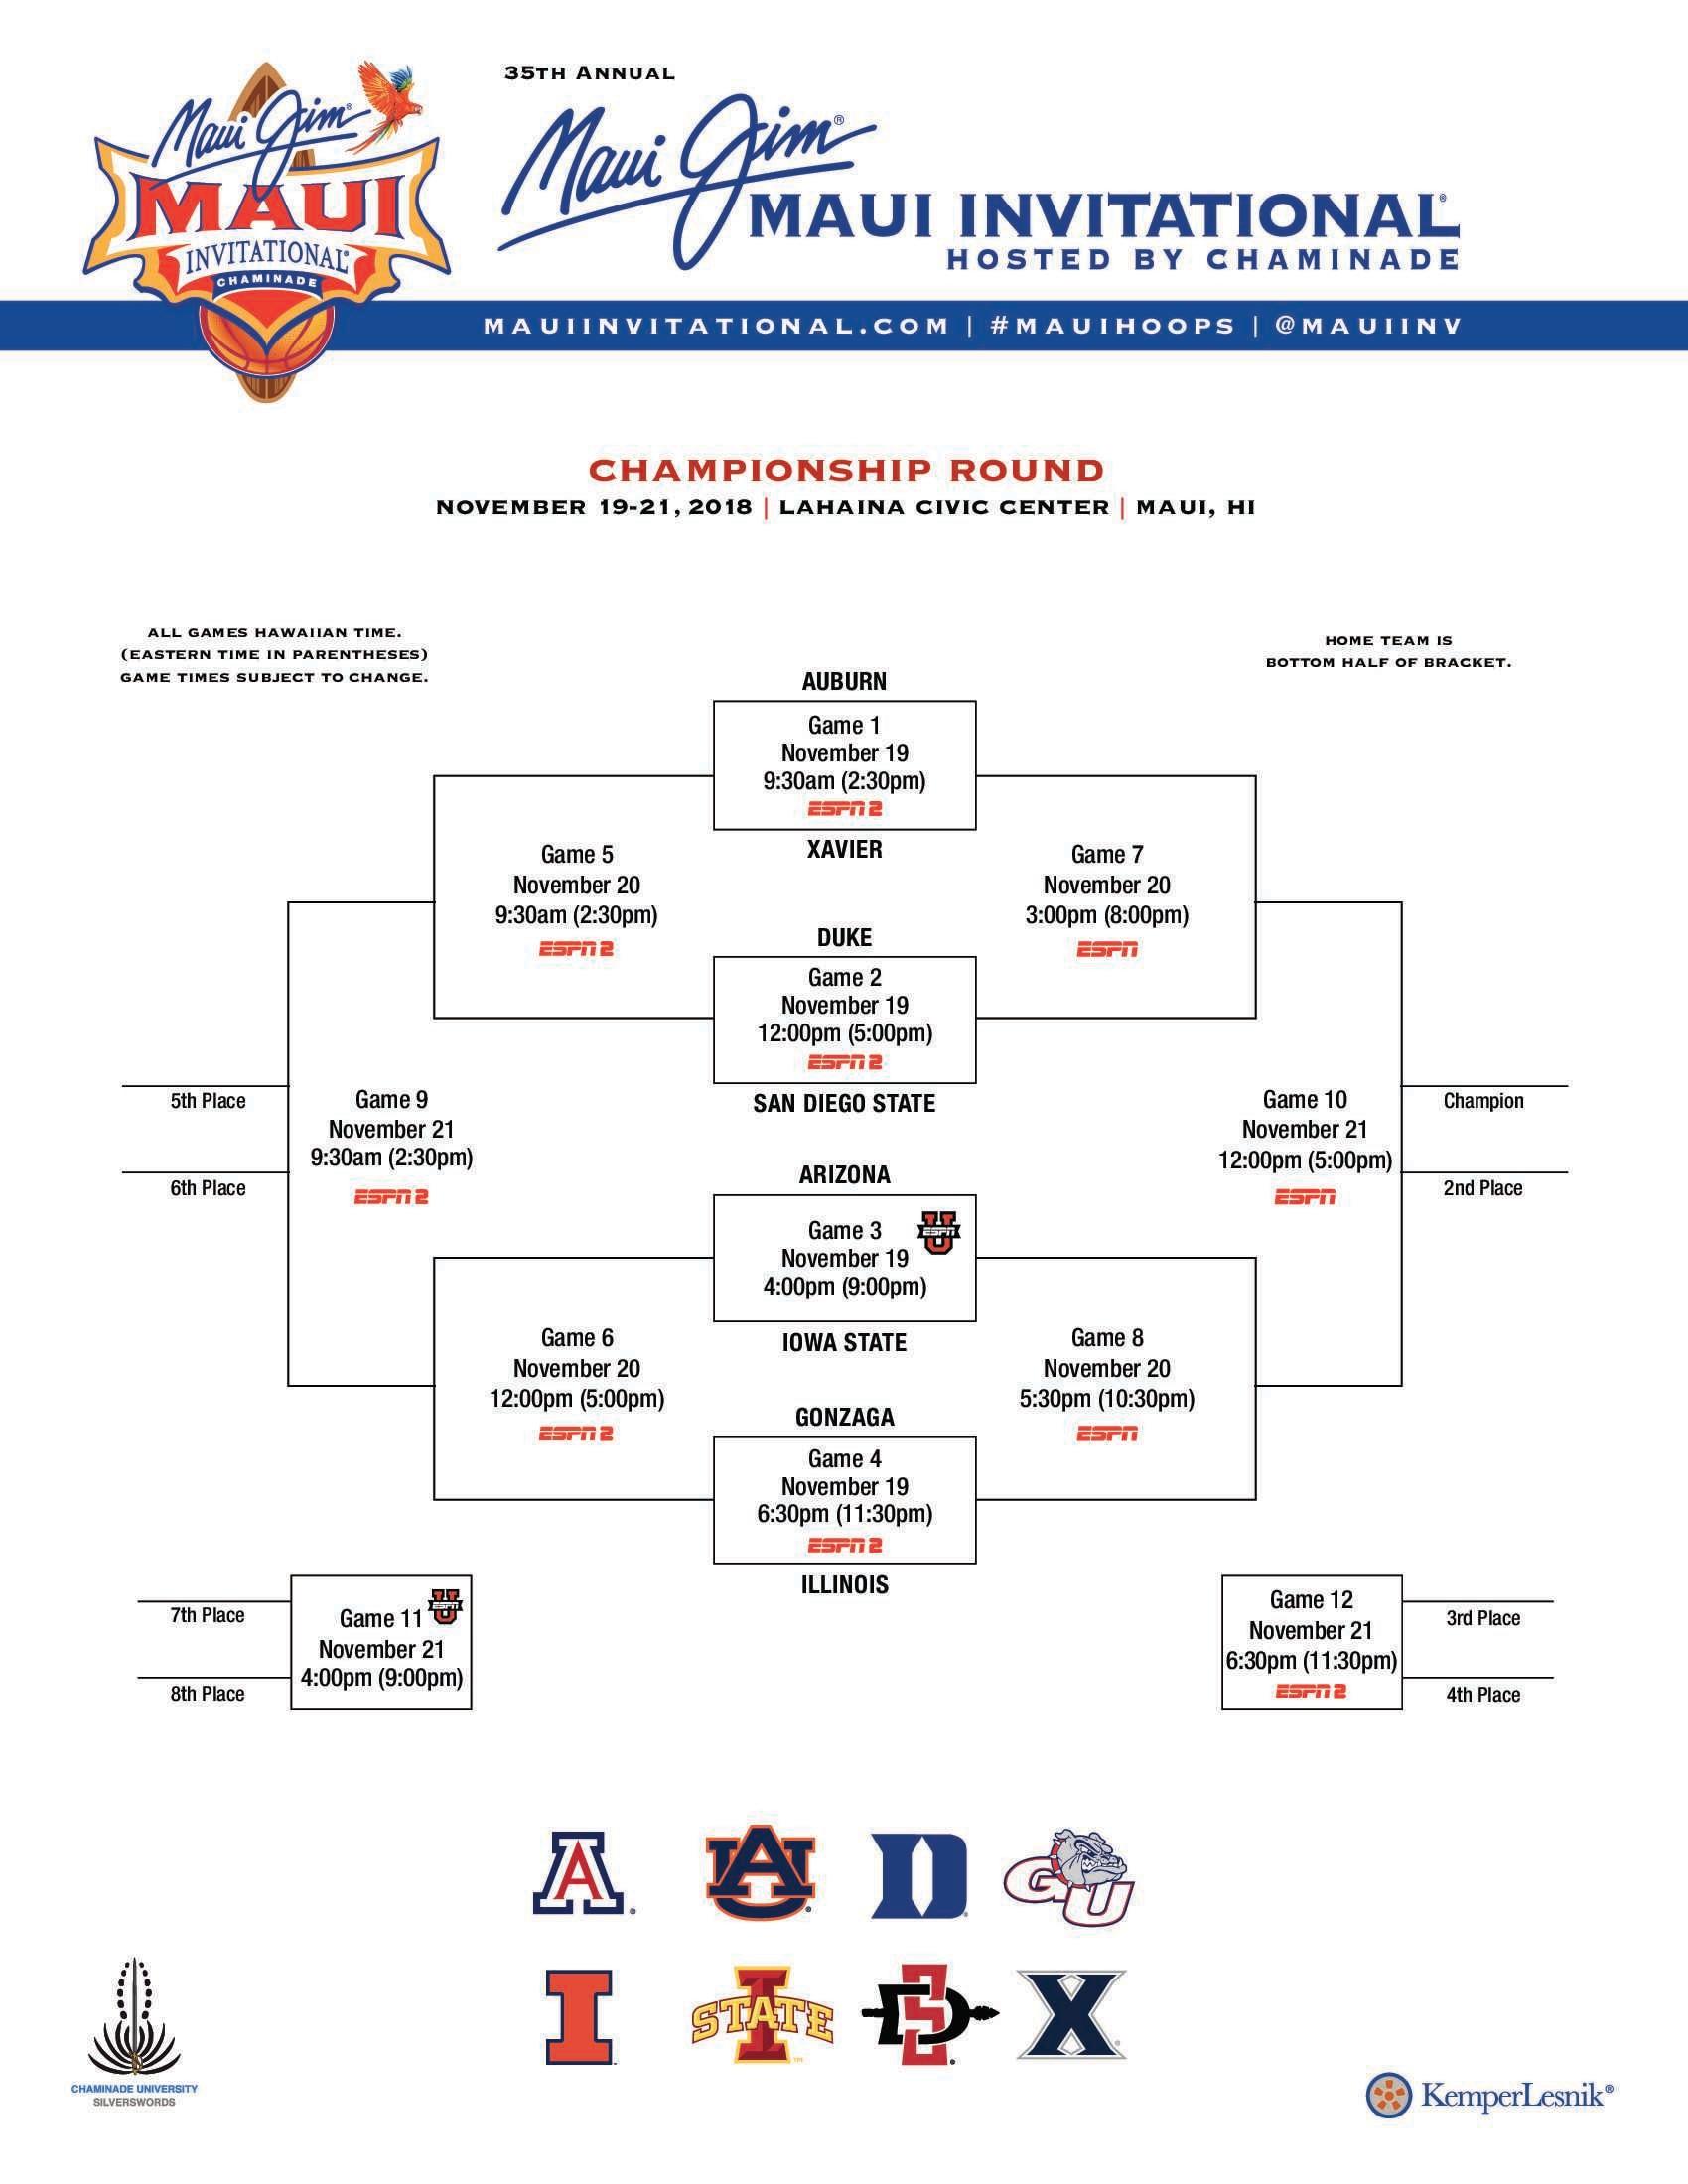 picture regarding Ku Basketball Schedule Printable identified as 2018 Maui Invitational: Routine, bracket, rankings